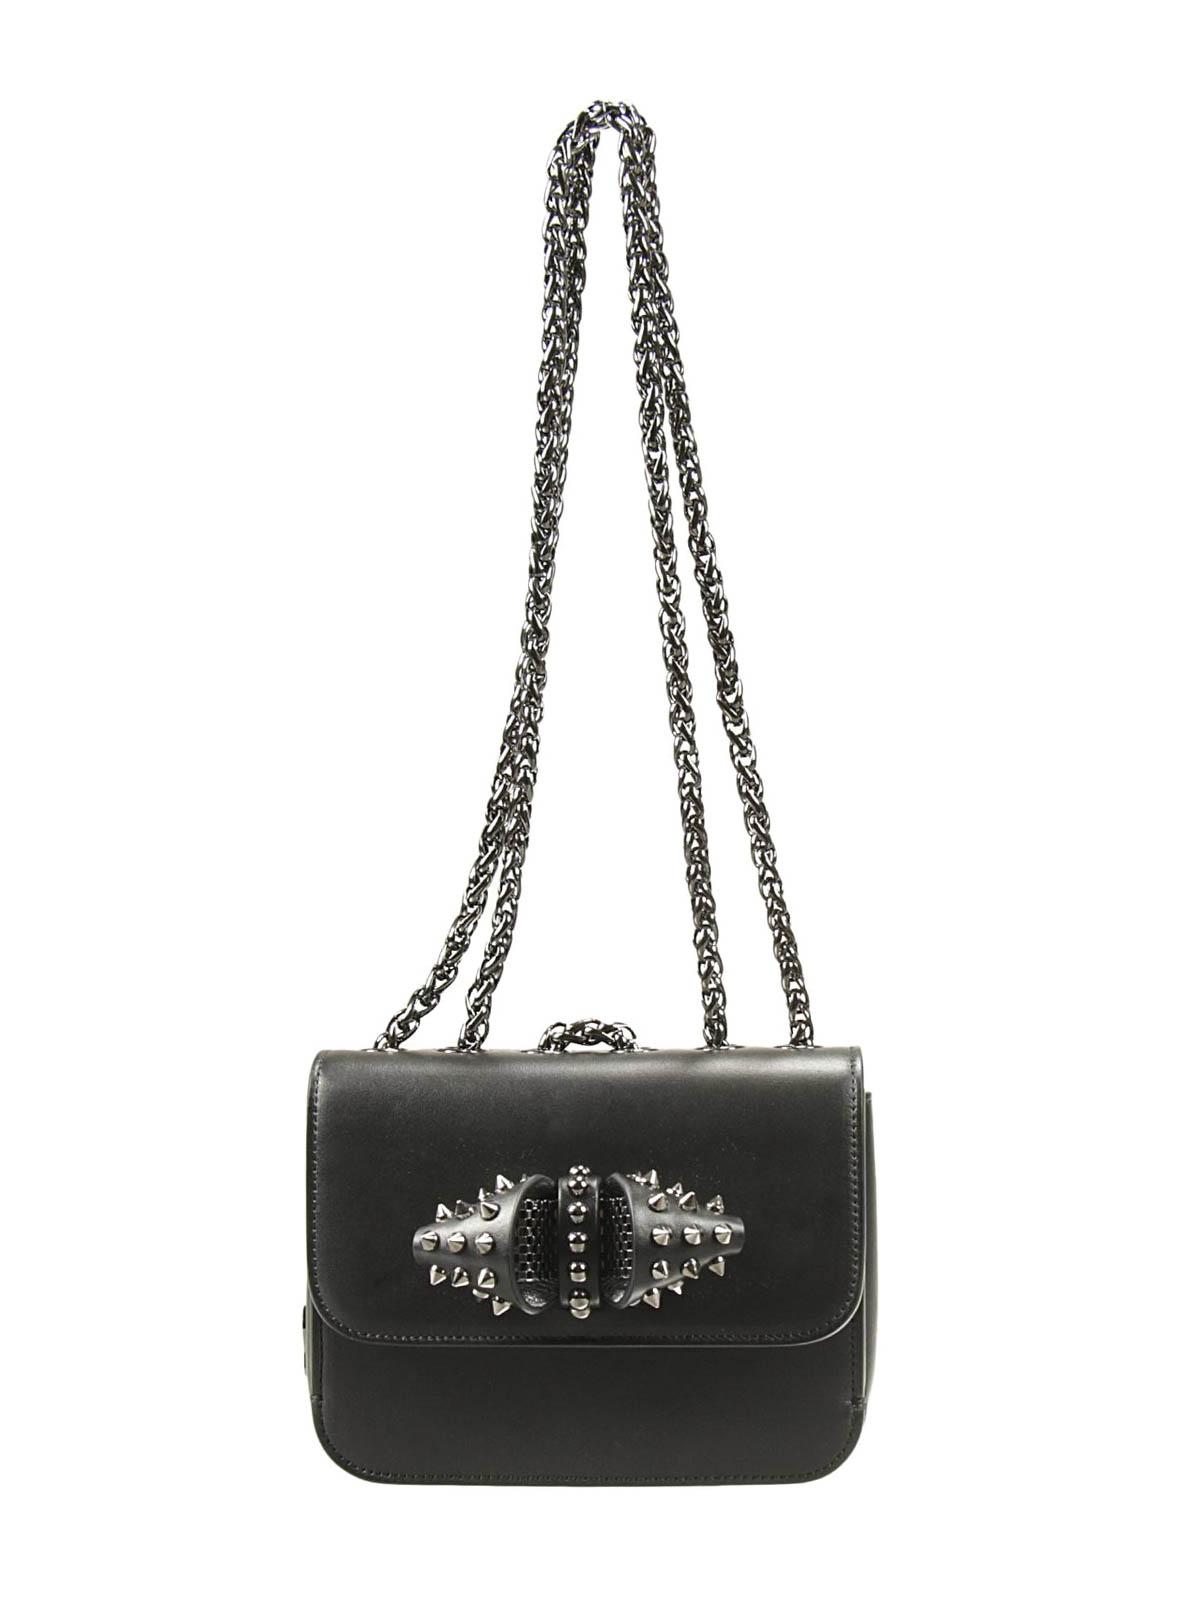 e3d948dd3c5 Christian Louboutin - Sweet Charity bag - shoulder bags - 1165031B078